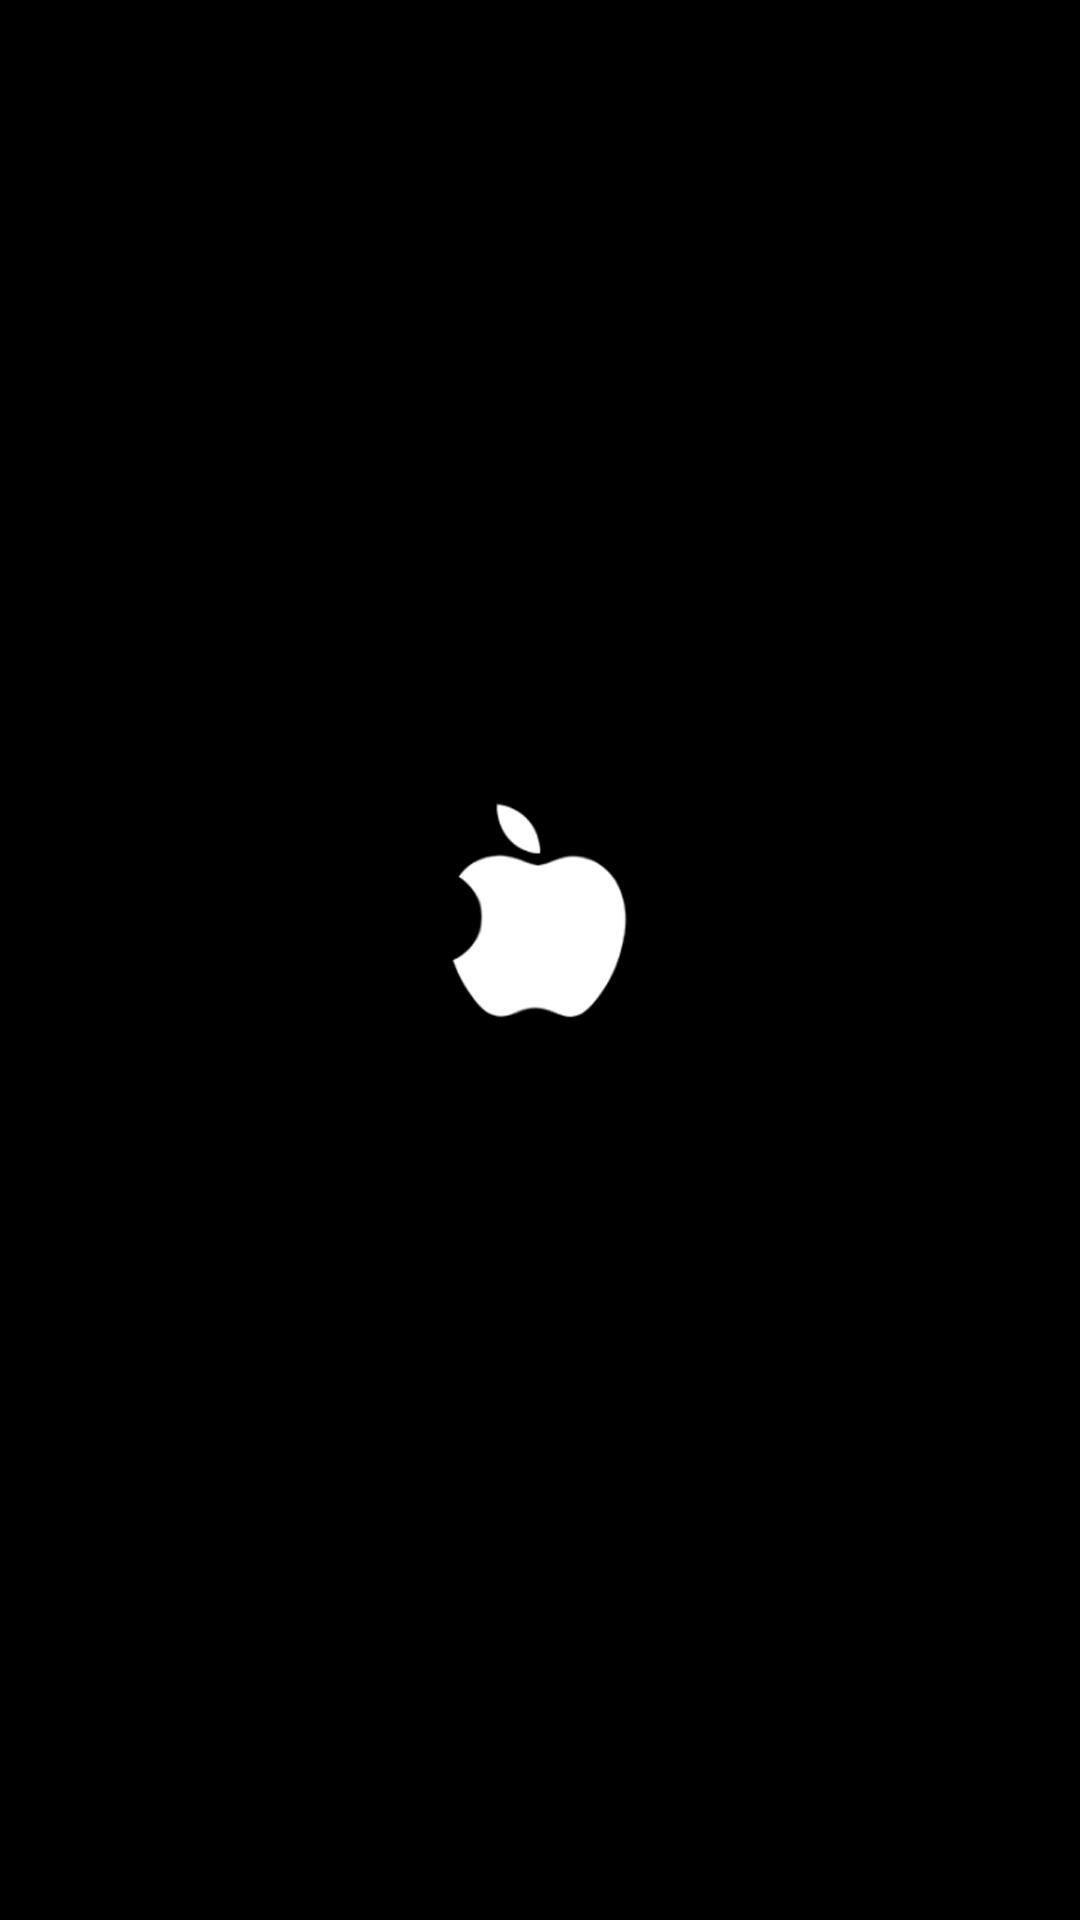 Wallpaper Black Apple For iPhone 7.